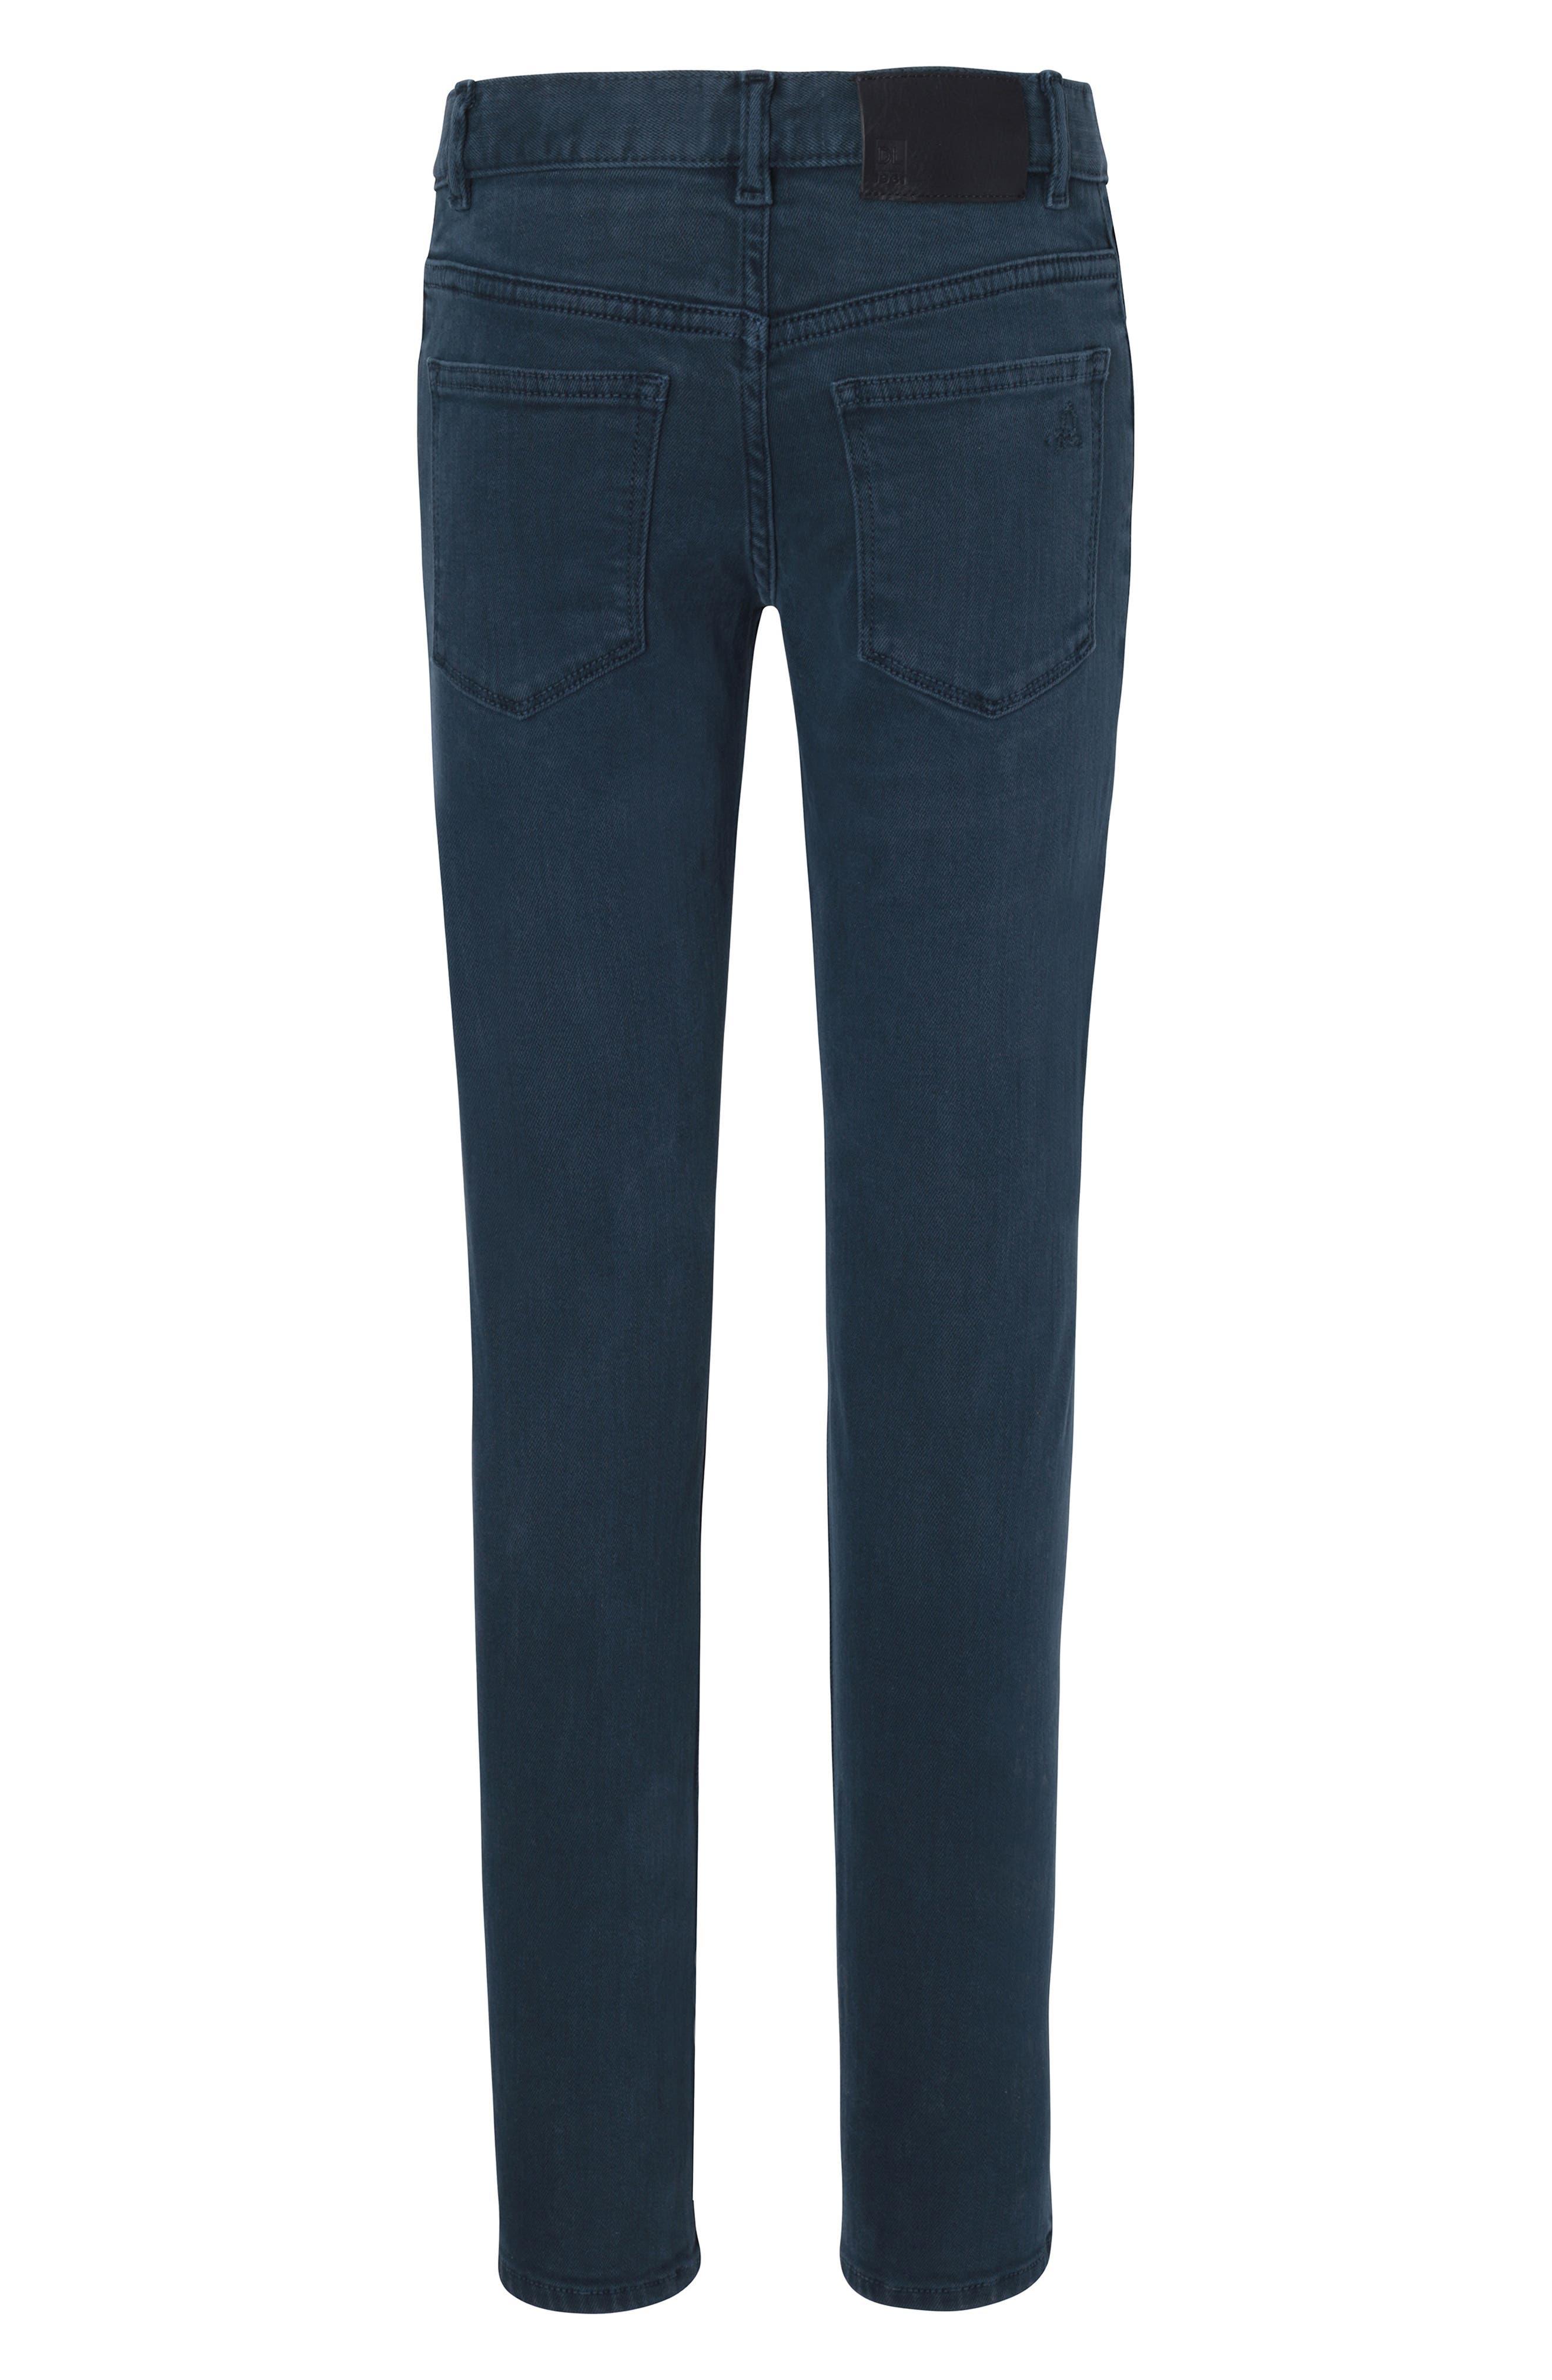 Hawke Skinny Jeans,                             Alternate thumbnail 2, color,                             410